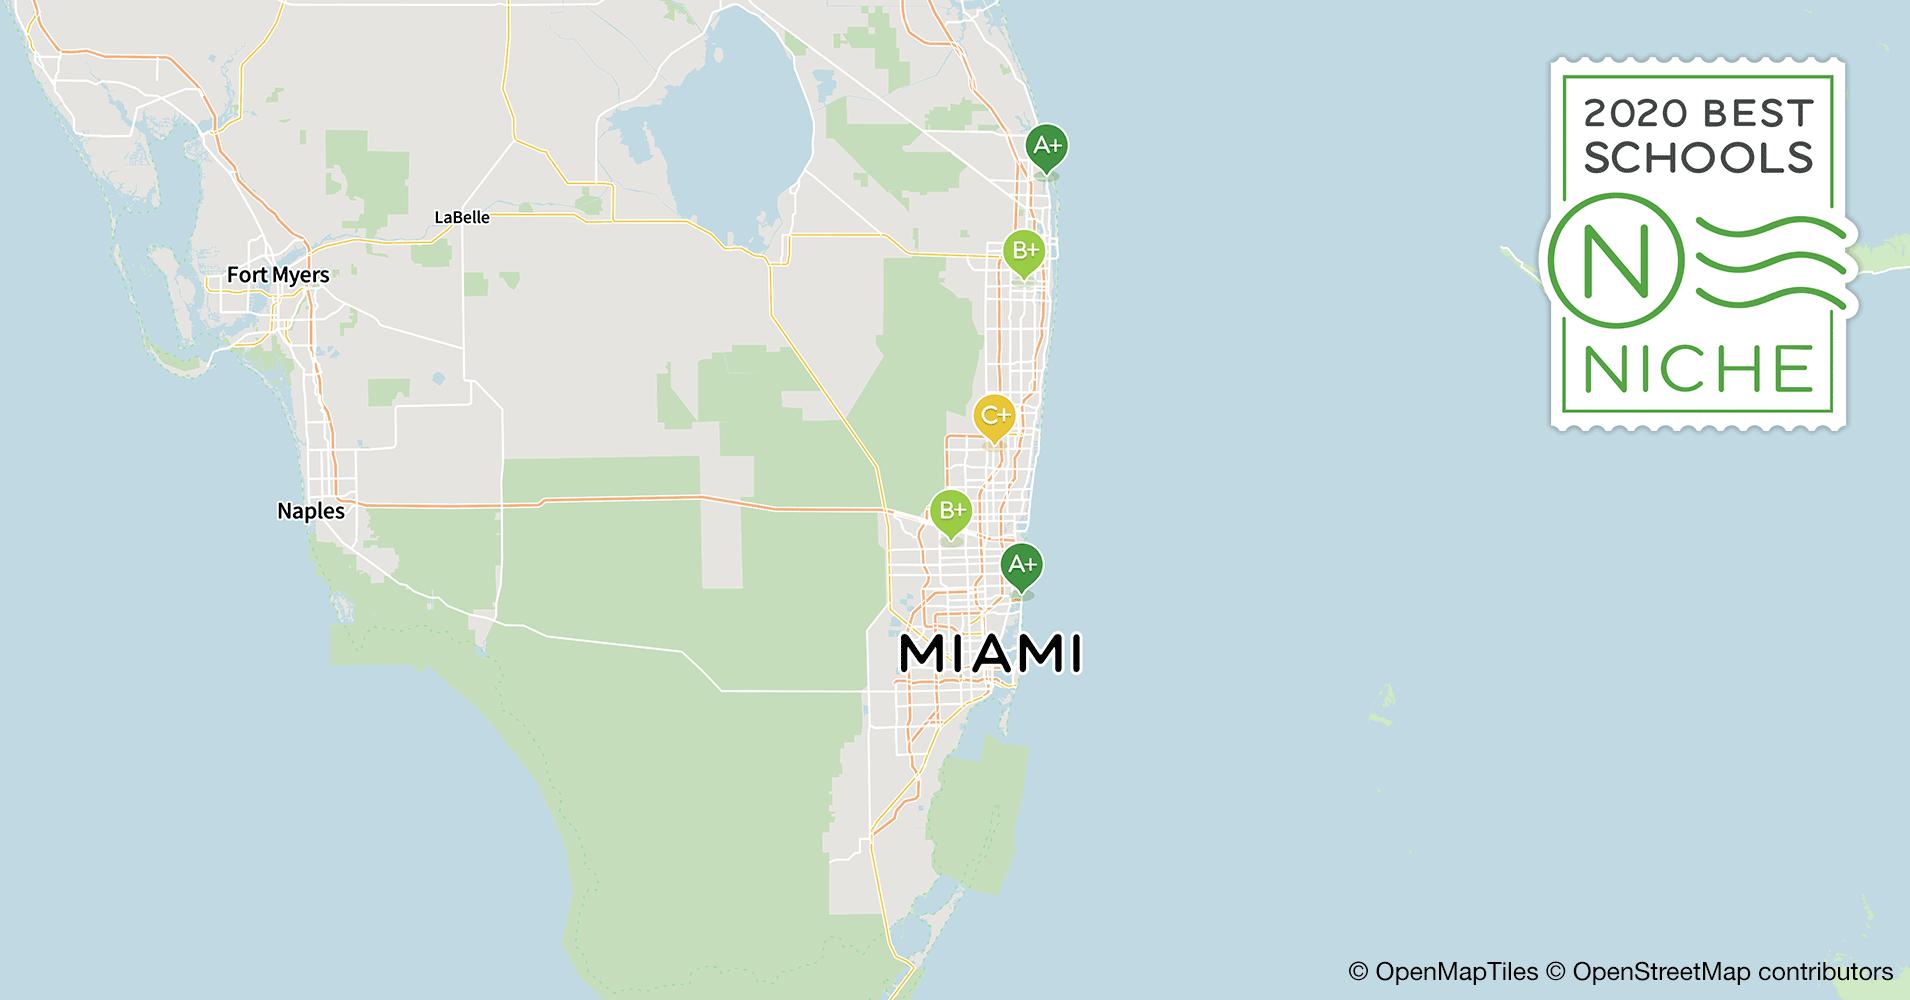 2020 Best Magnet High Schools in the Miami Area - Niche